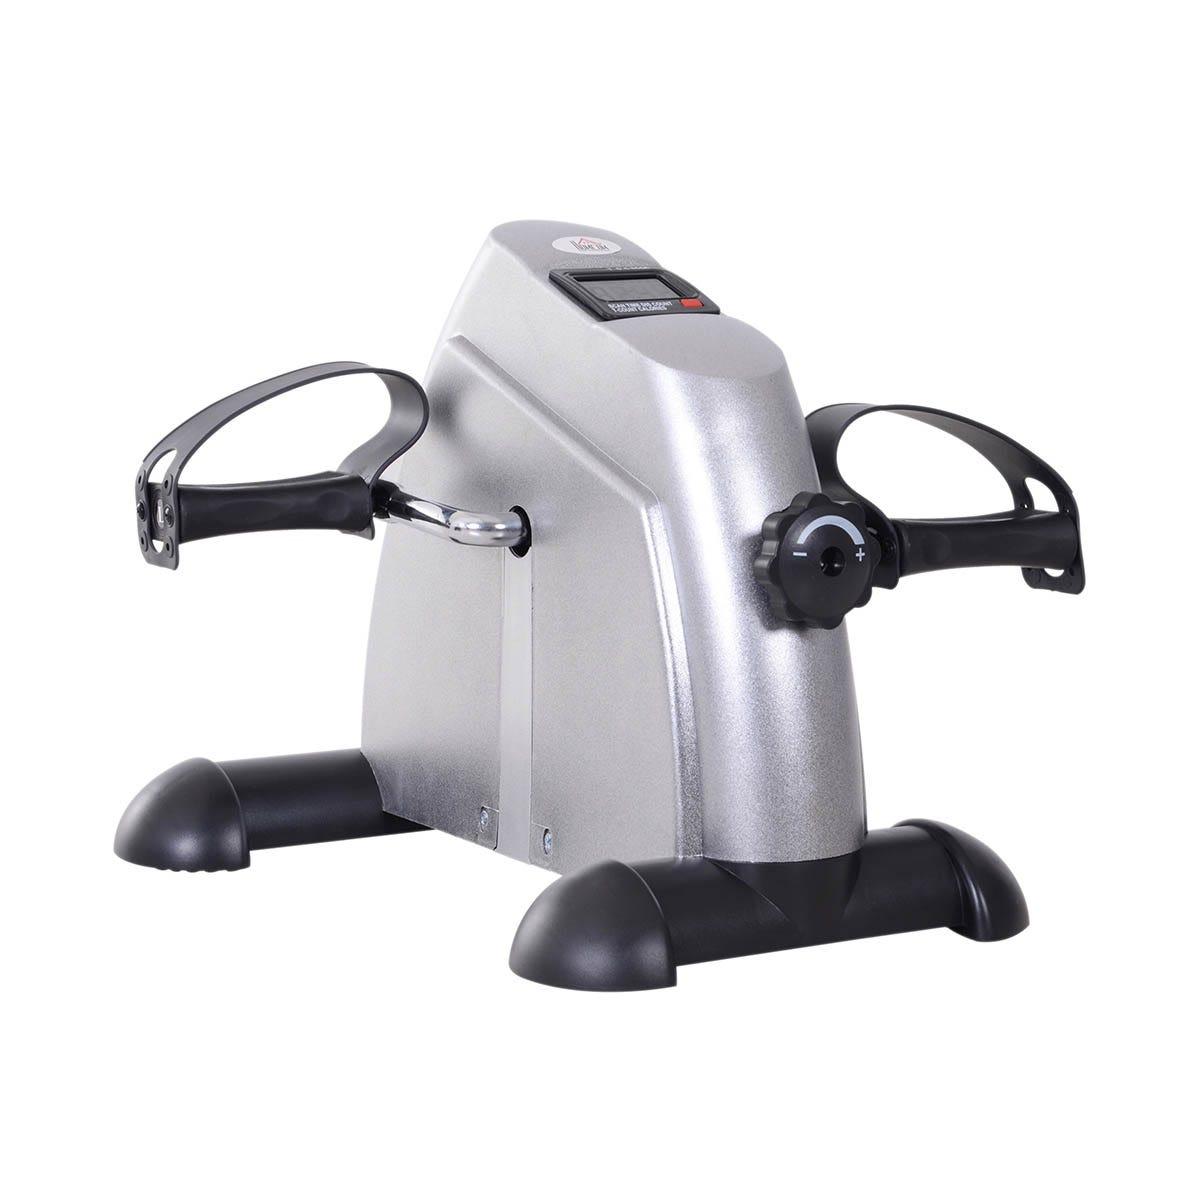 HOMCOM Mini Exercise Bike Portable Pedal Manual Machine Indoor Fitness Silver